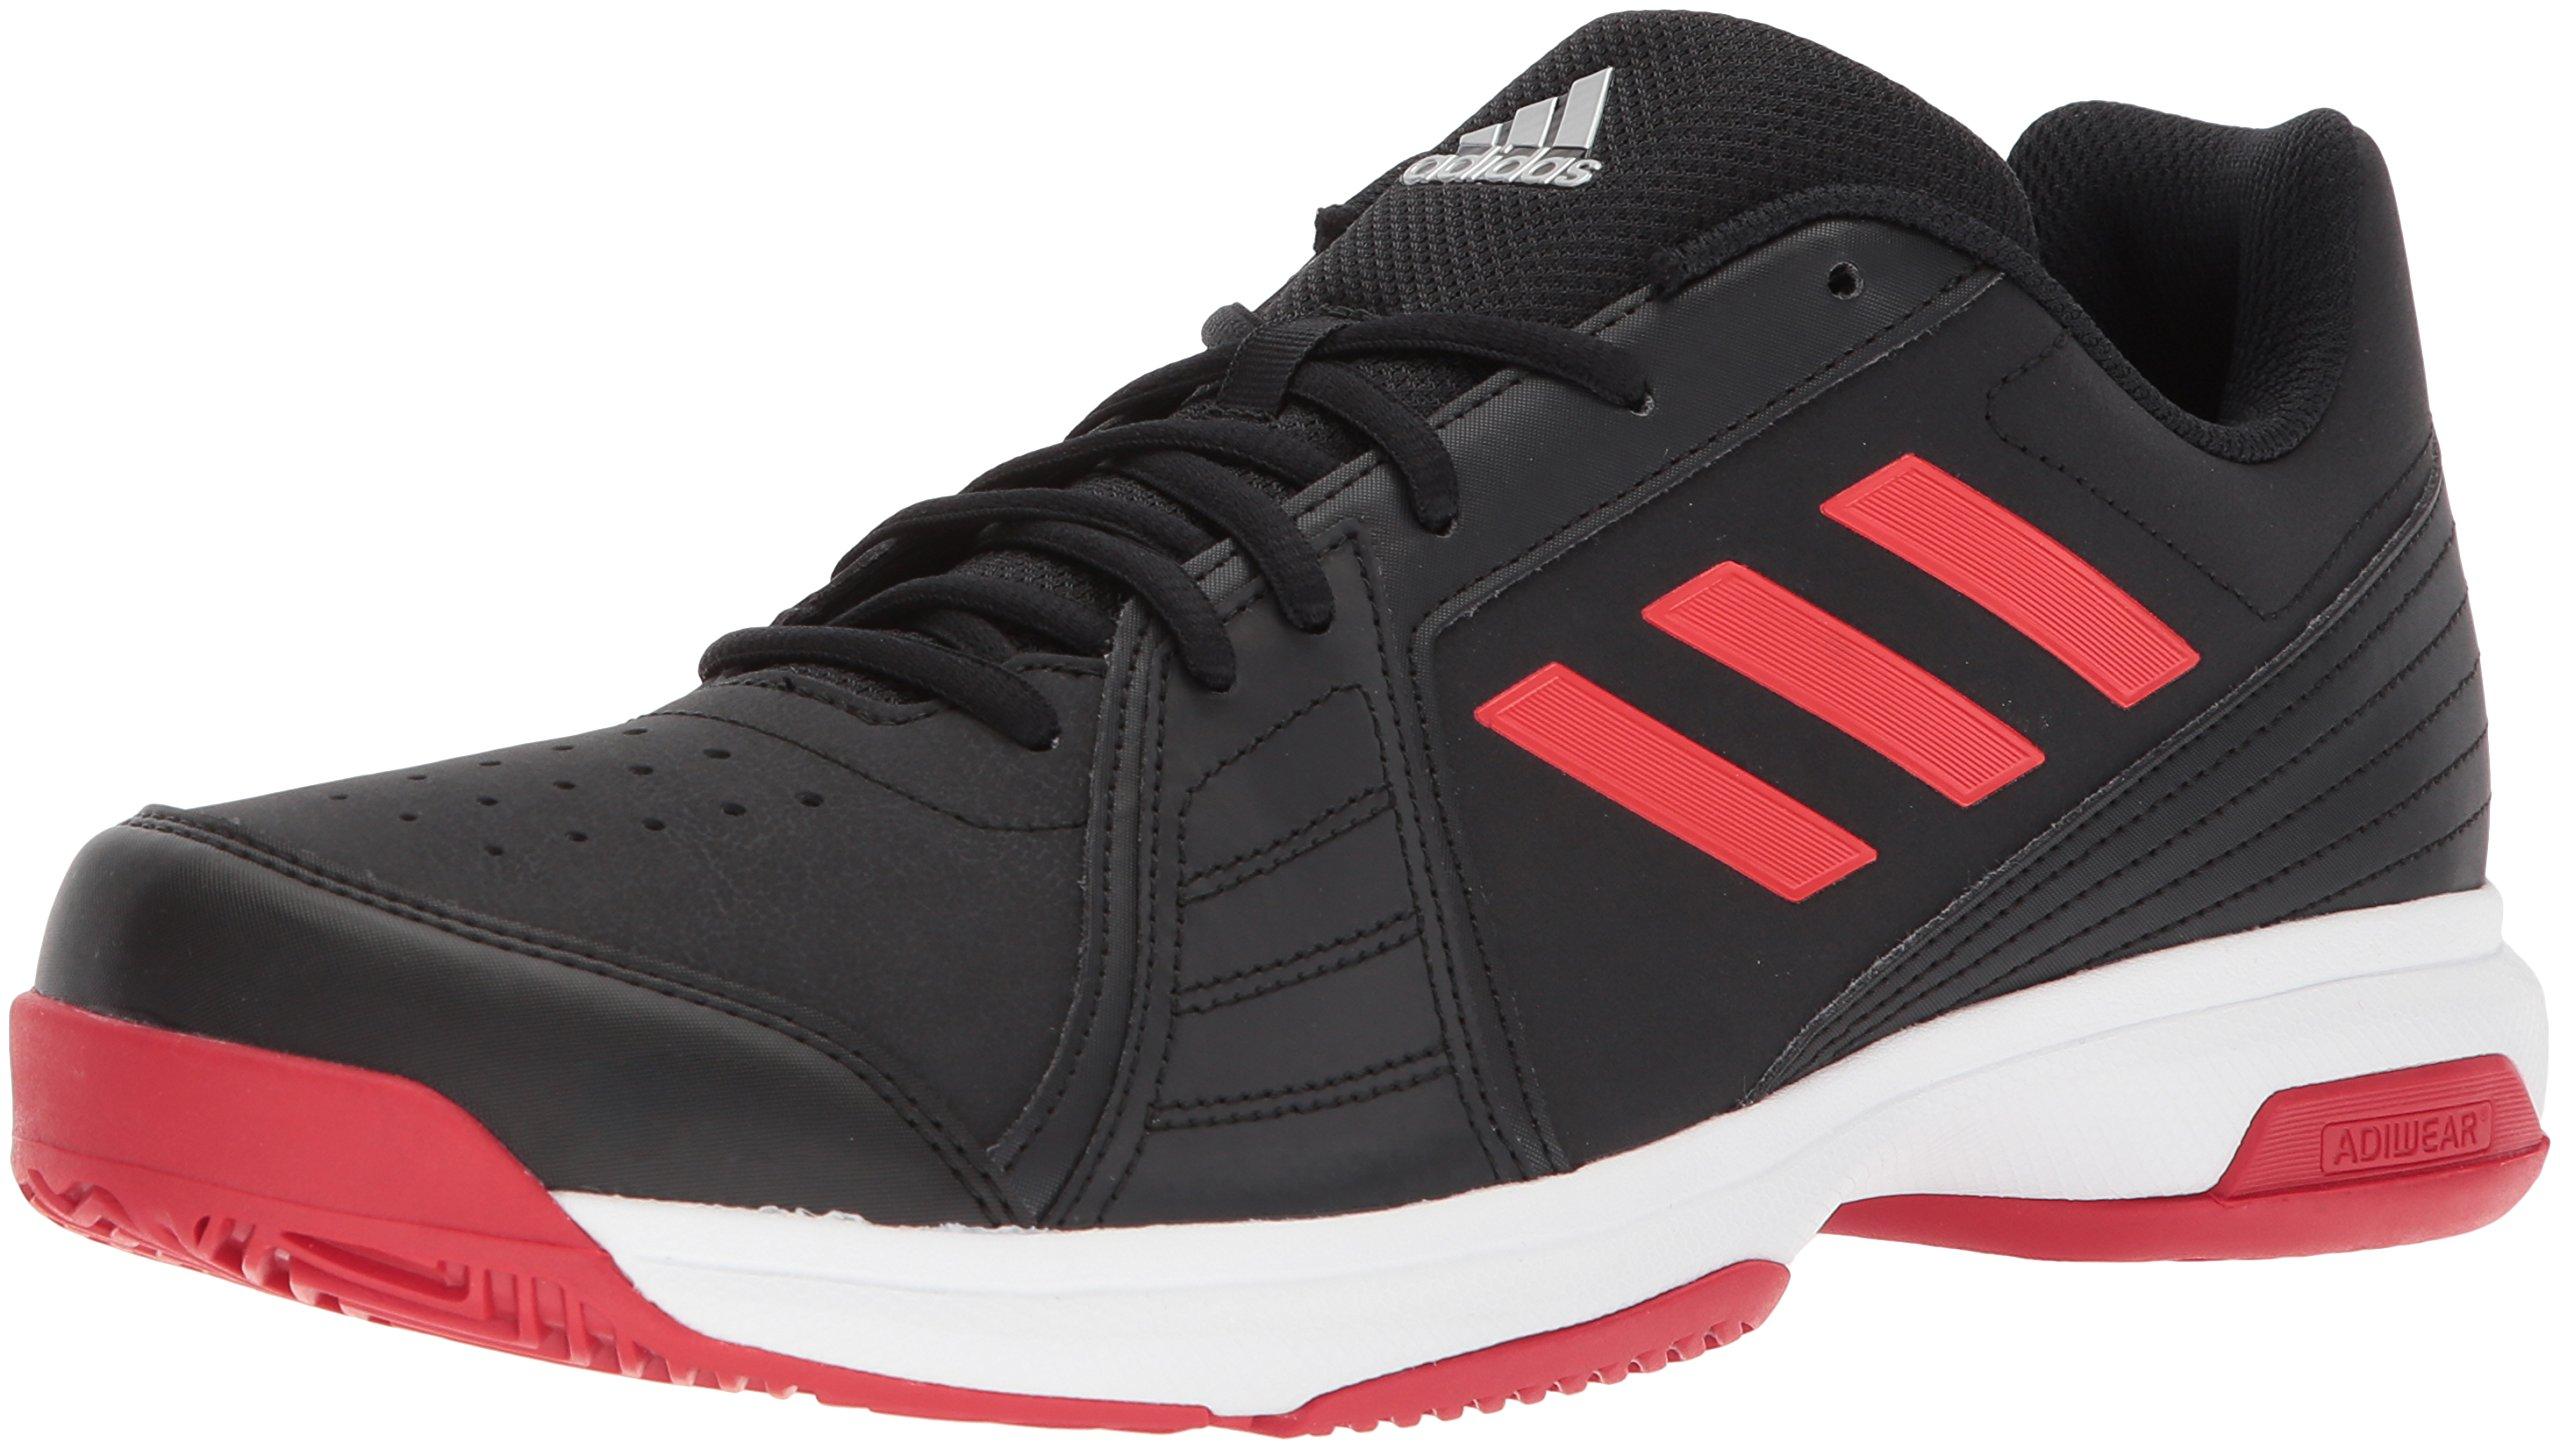 adidas Men's Approach Tennis Shoe, Core Black/Scarlet/White, 11.5 M US